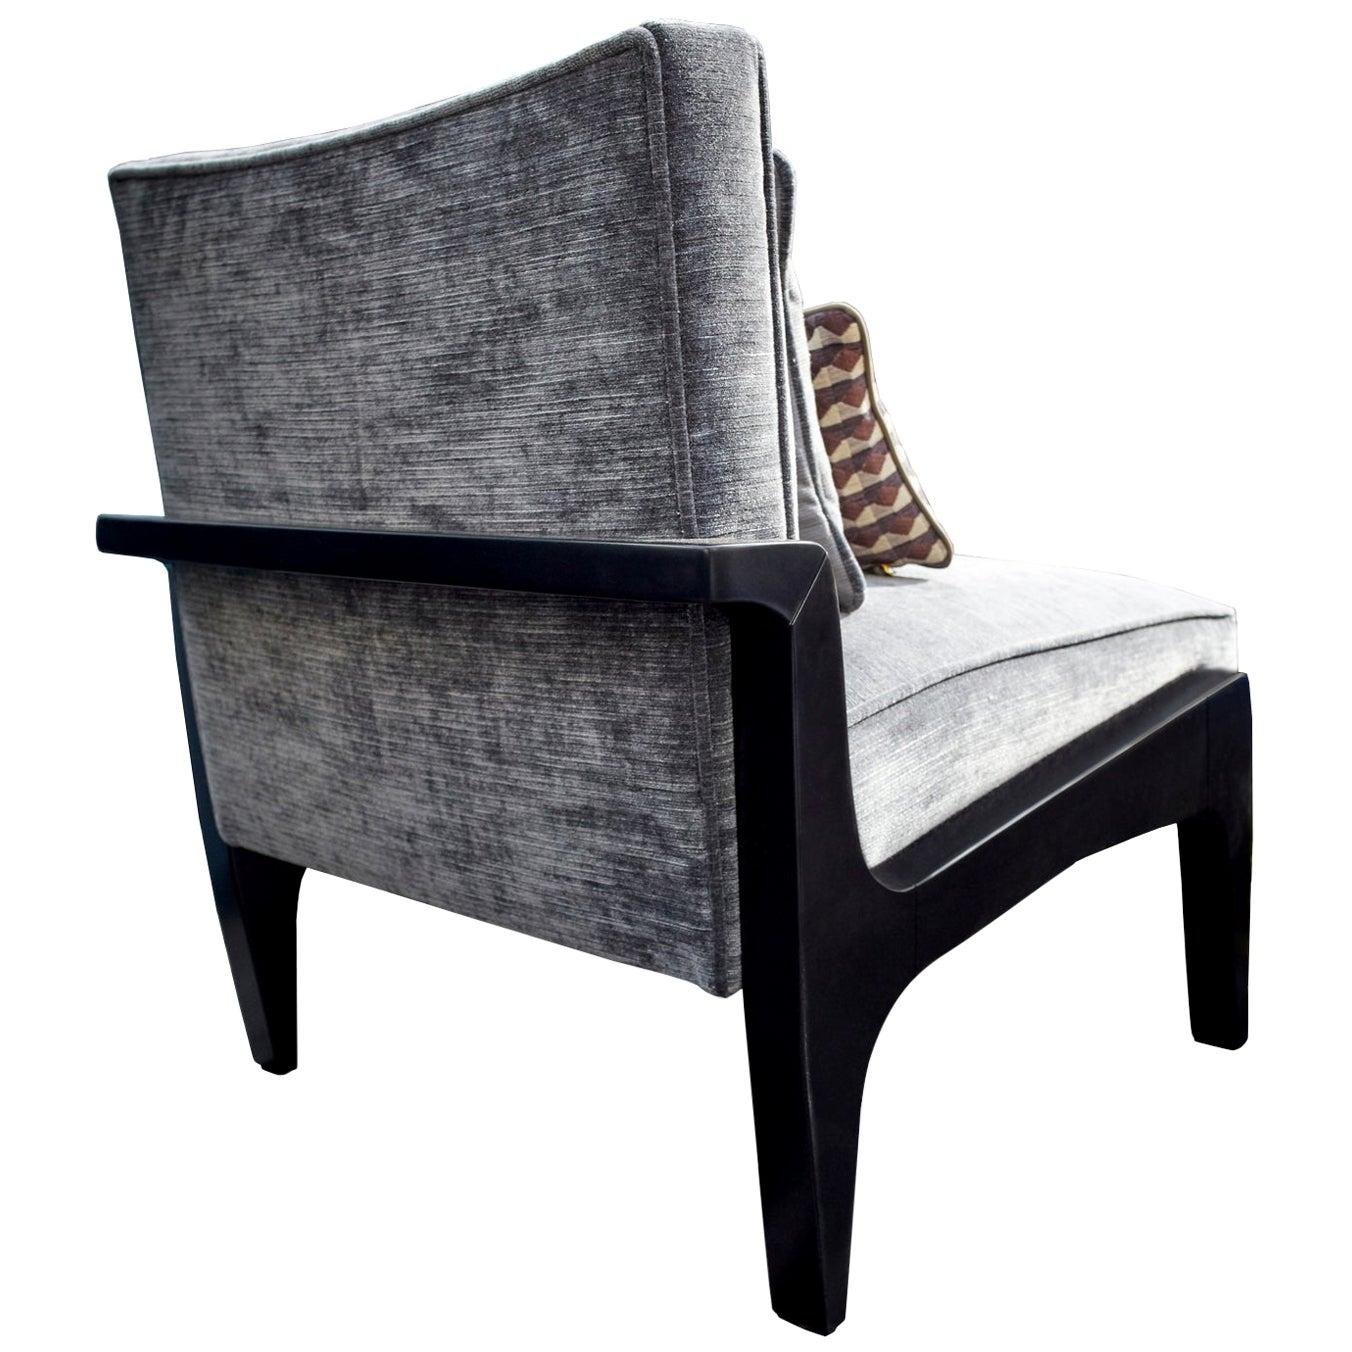 Art Deco Inspired Atena Chair Black Ebony and Grey Ribbed Velvet